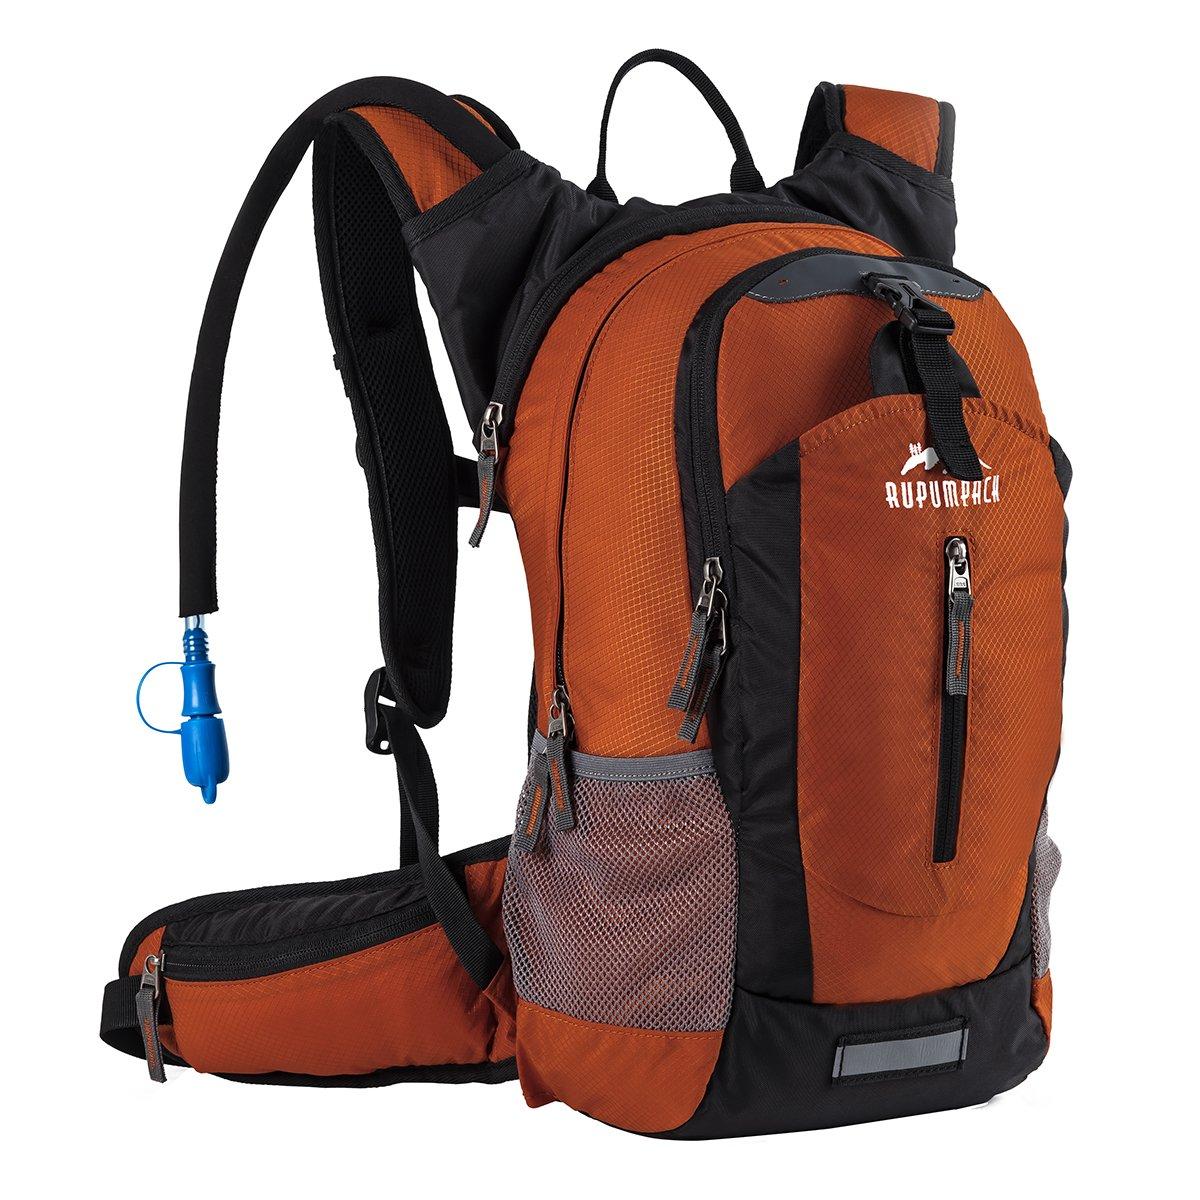 RUPUMPACK Insulated Hydration Backpack Pack